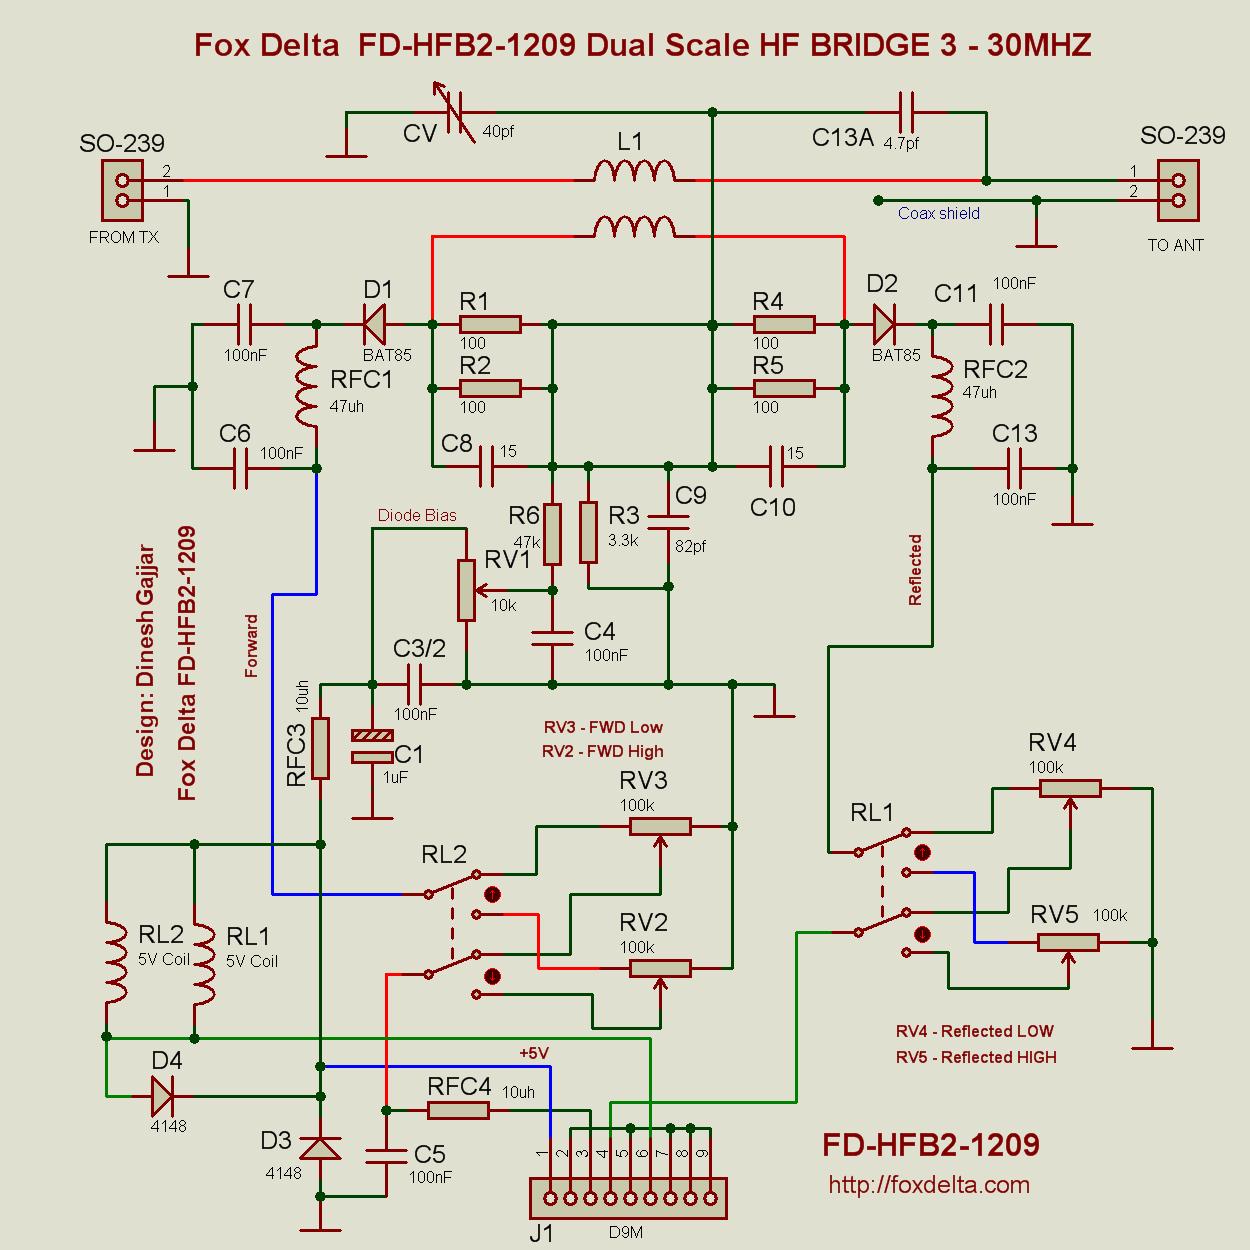 Hf Swr Schematic Wire Data Schema Af15tri 15 Amp Afci Arc Fault Circuit Interrupter Ivory Fox Delta 100w To 1kw Dual Scale Bridge By Tony I2tzk Frank Rh Foxdelta